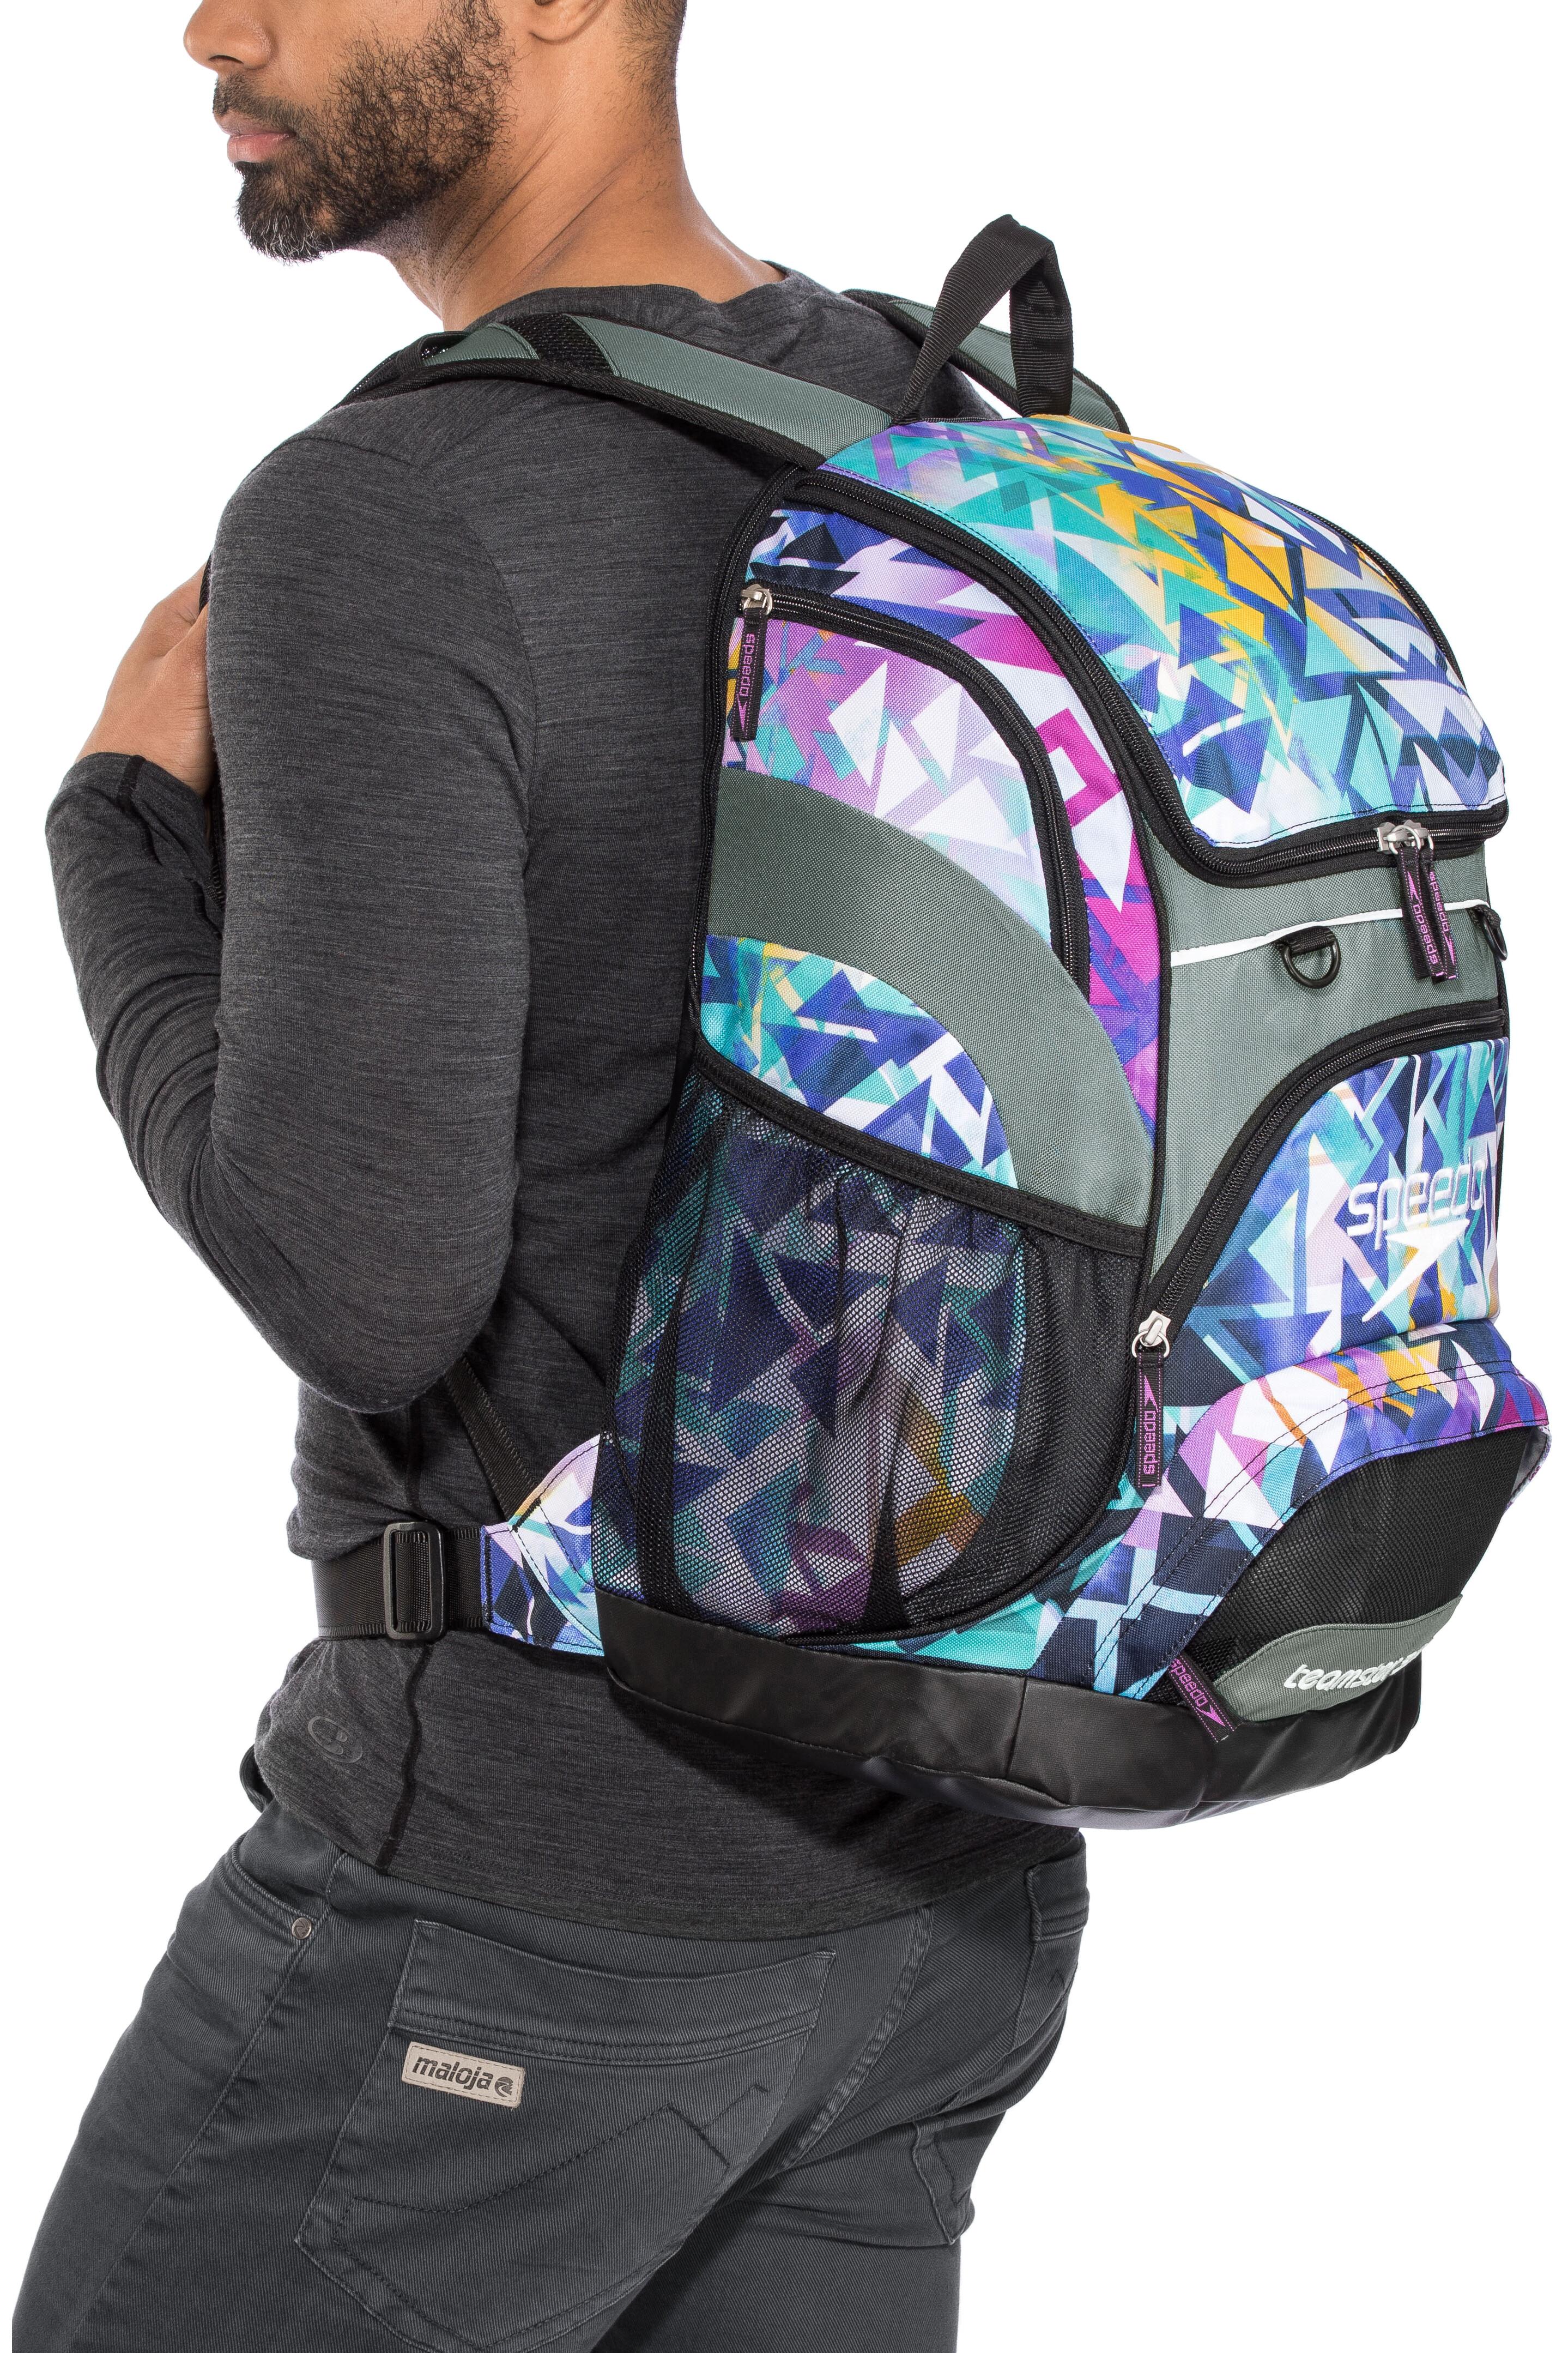 a2e6923ac842f3 speedo Teamster Backpack L Unisex, multi/blue l Outdoor winkel campz.be